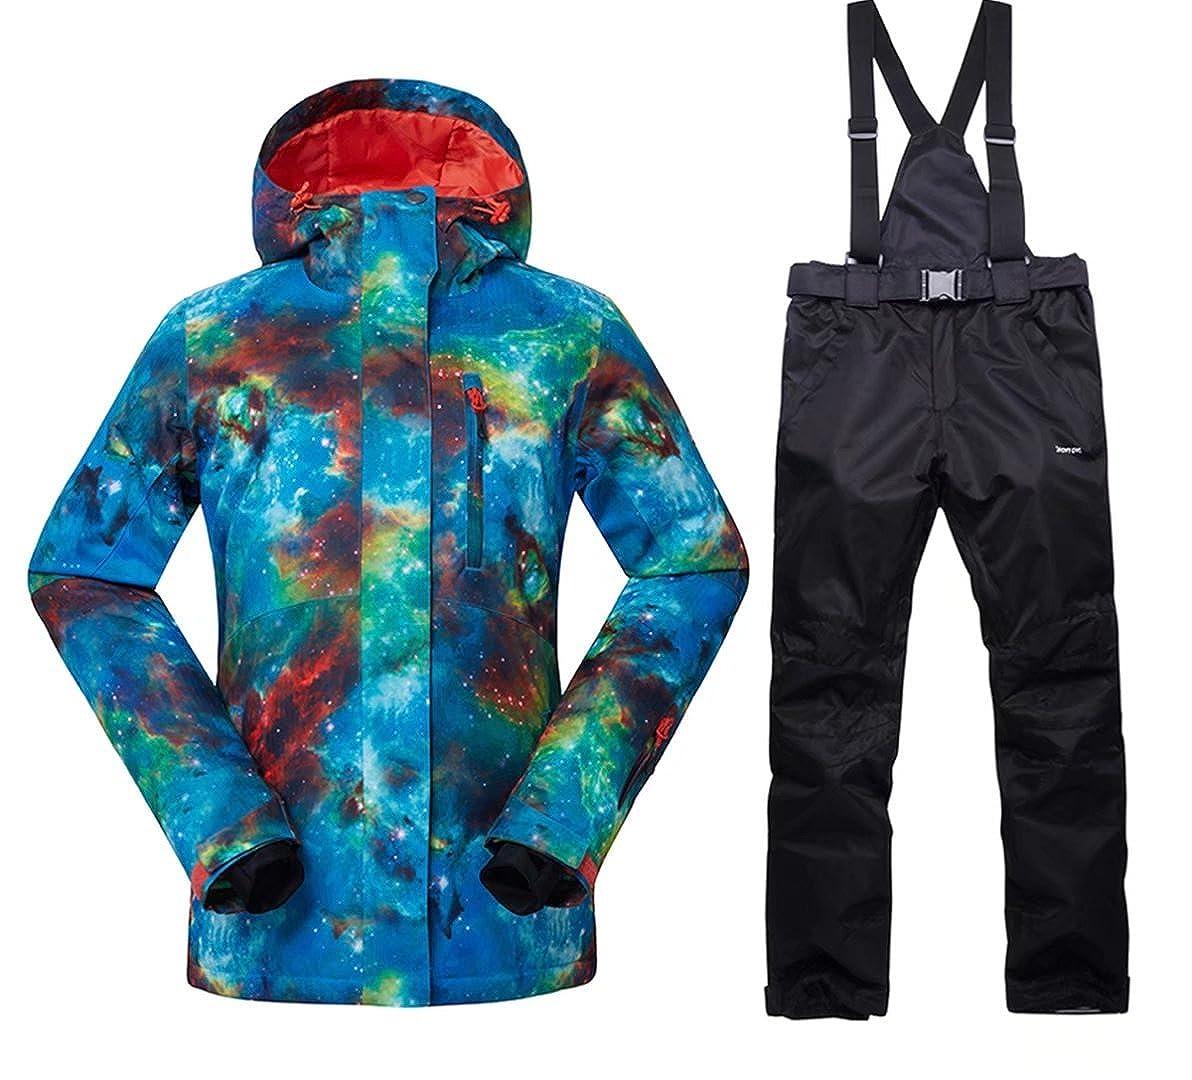 OLEK Women's High Windproof Technology Colorfull Printed Ski Jacket and Pants Wear